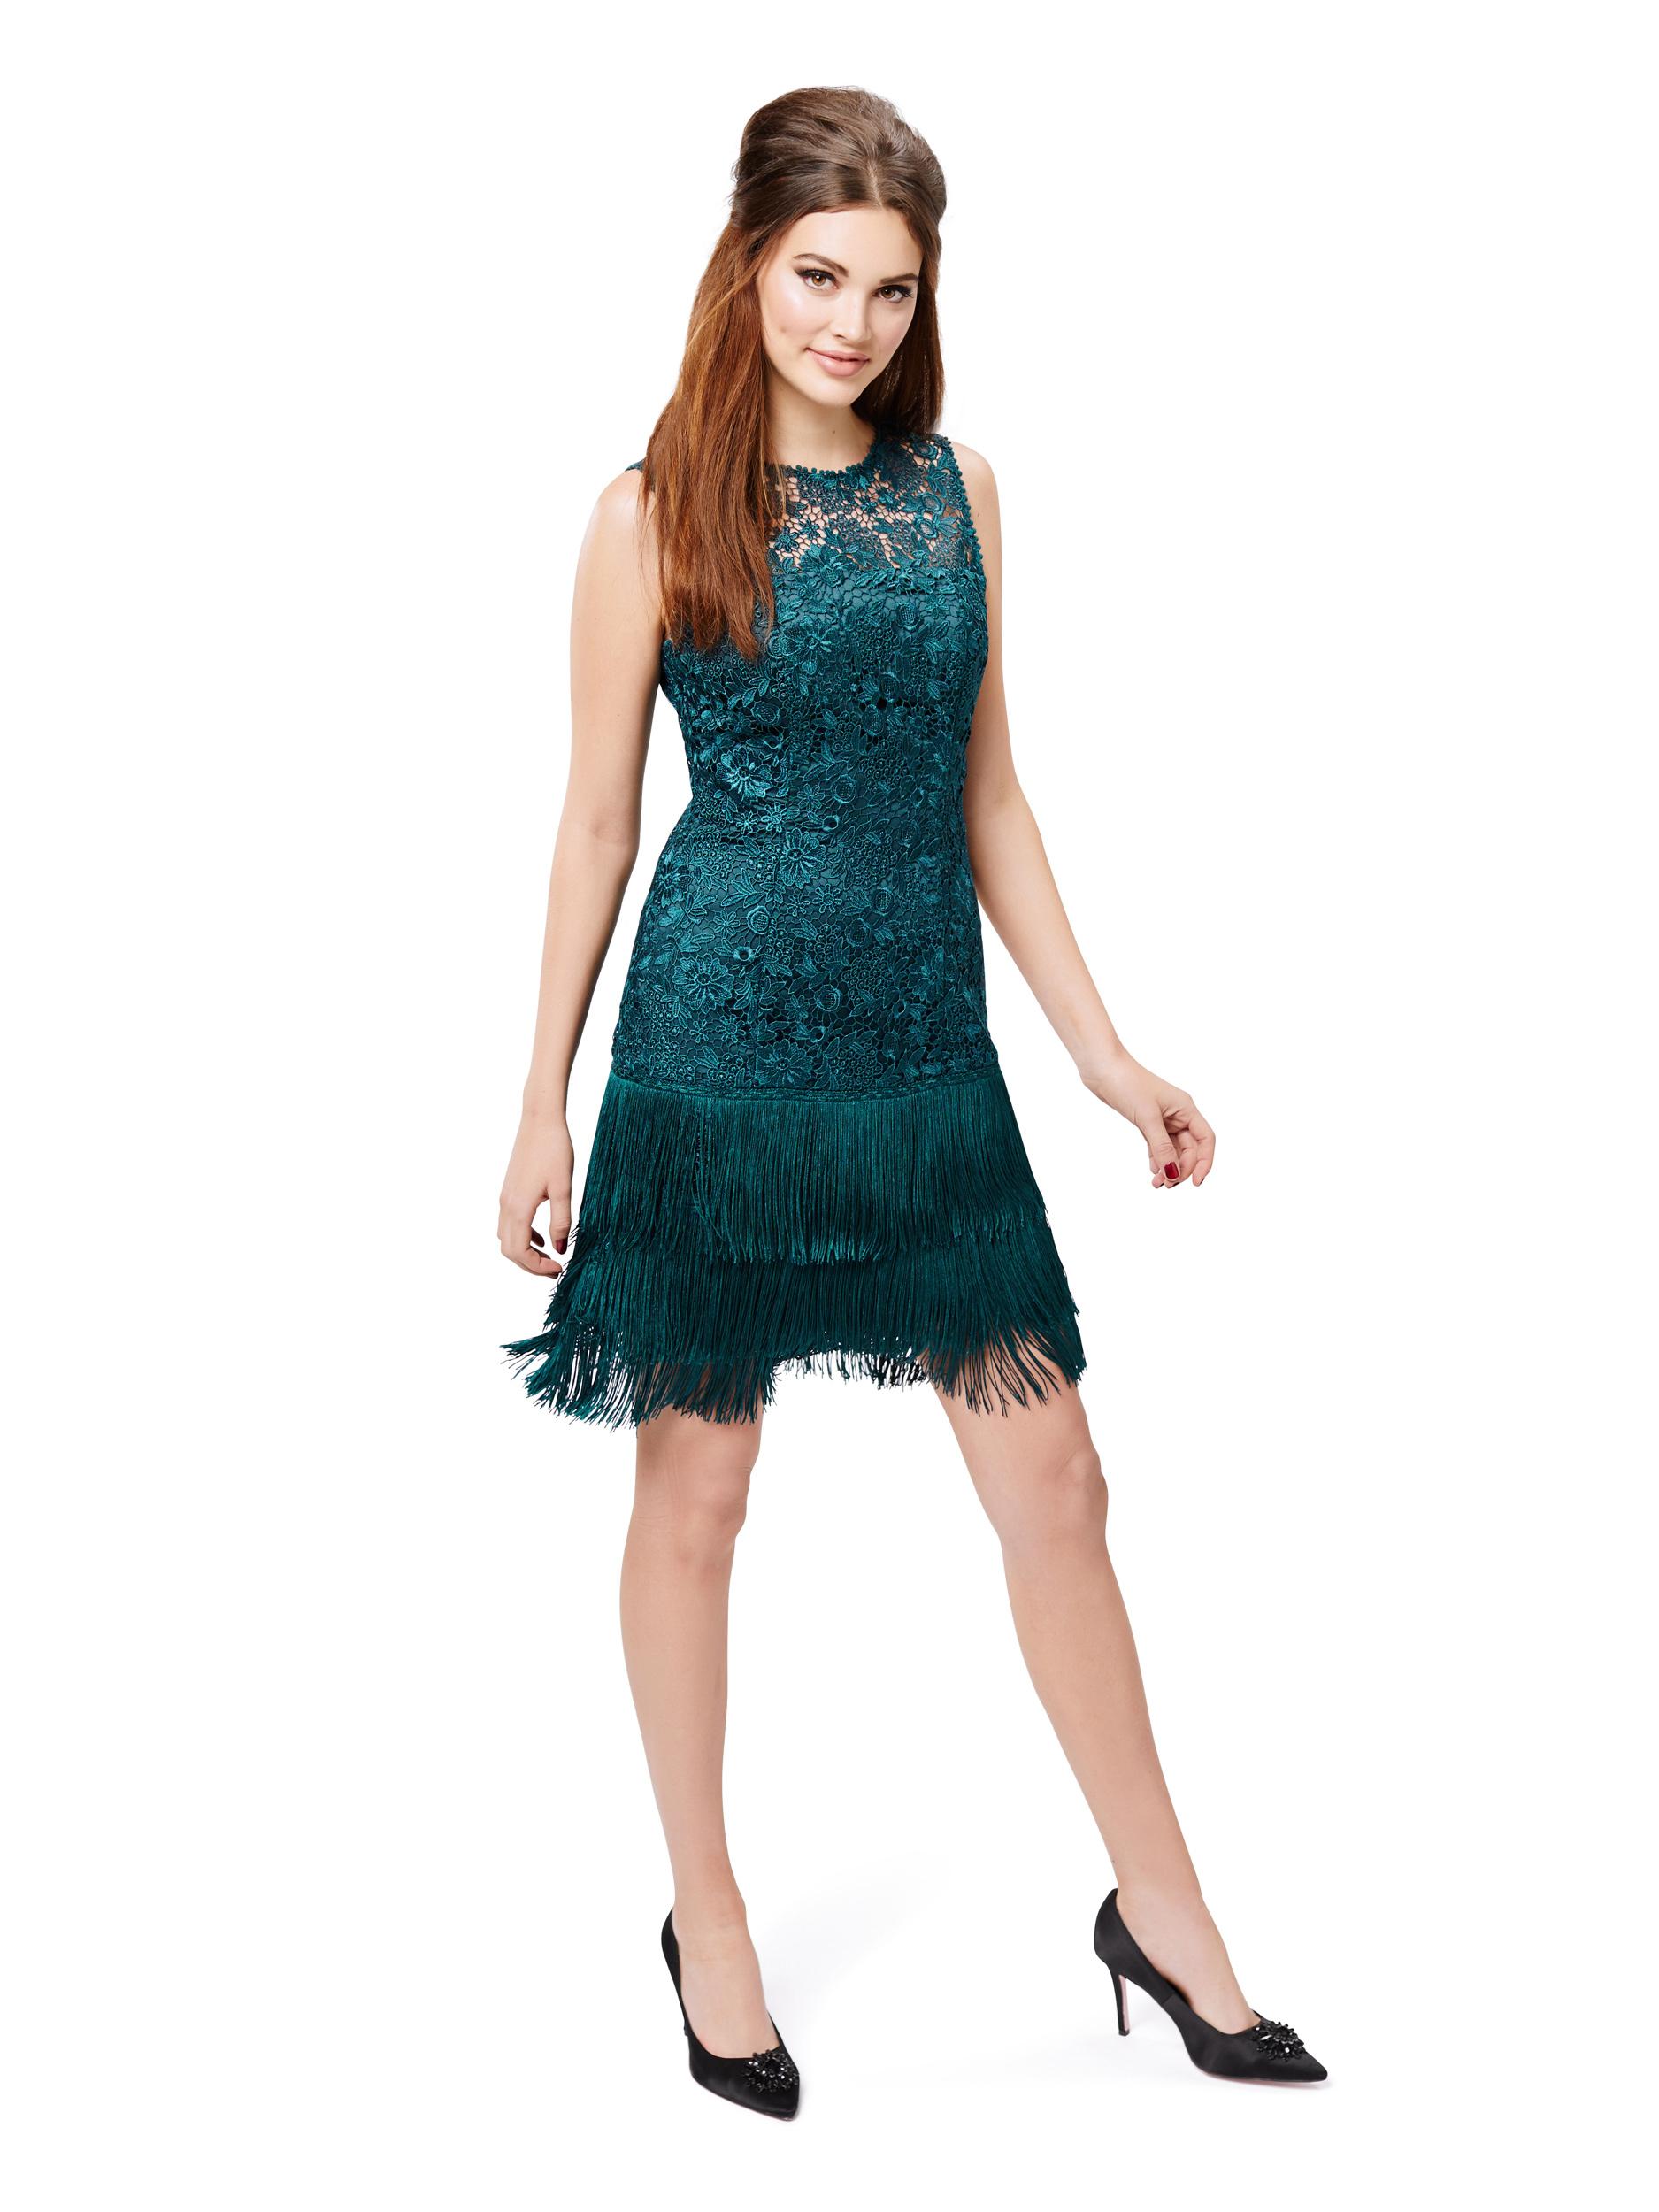 Atlanta Dress   Shop Dresses online today at Review.